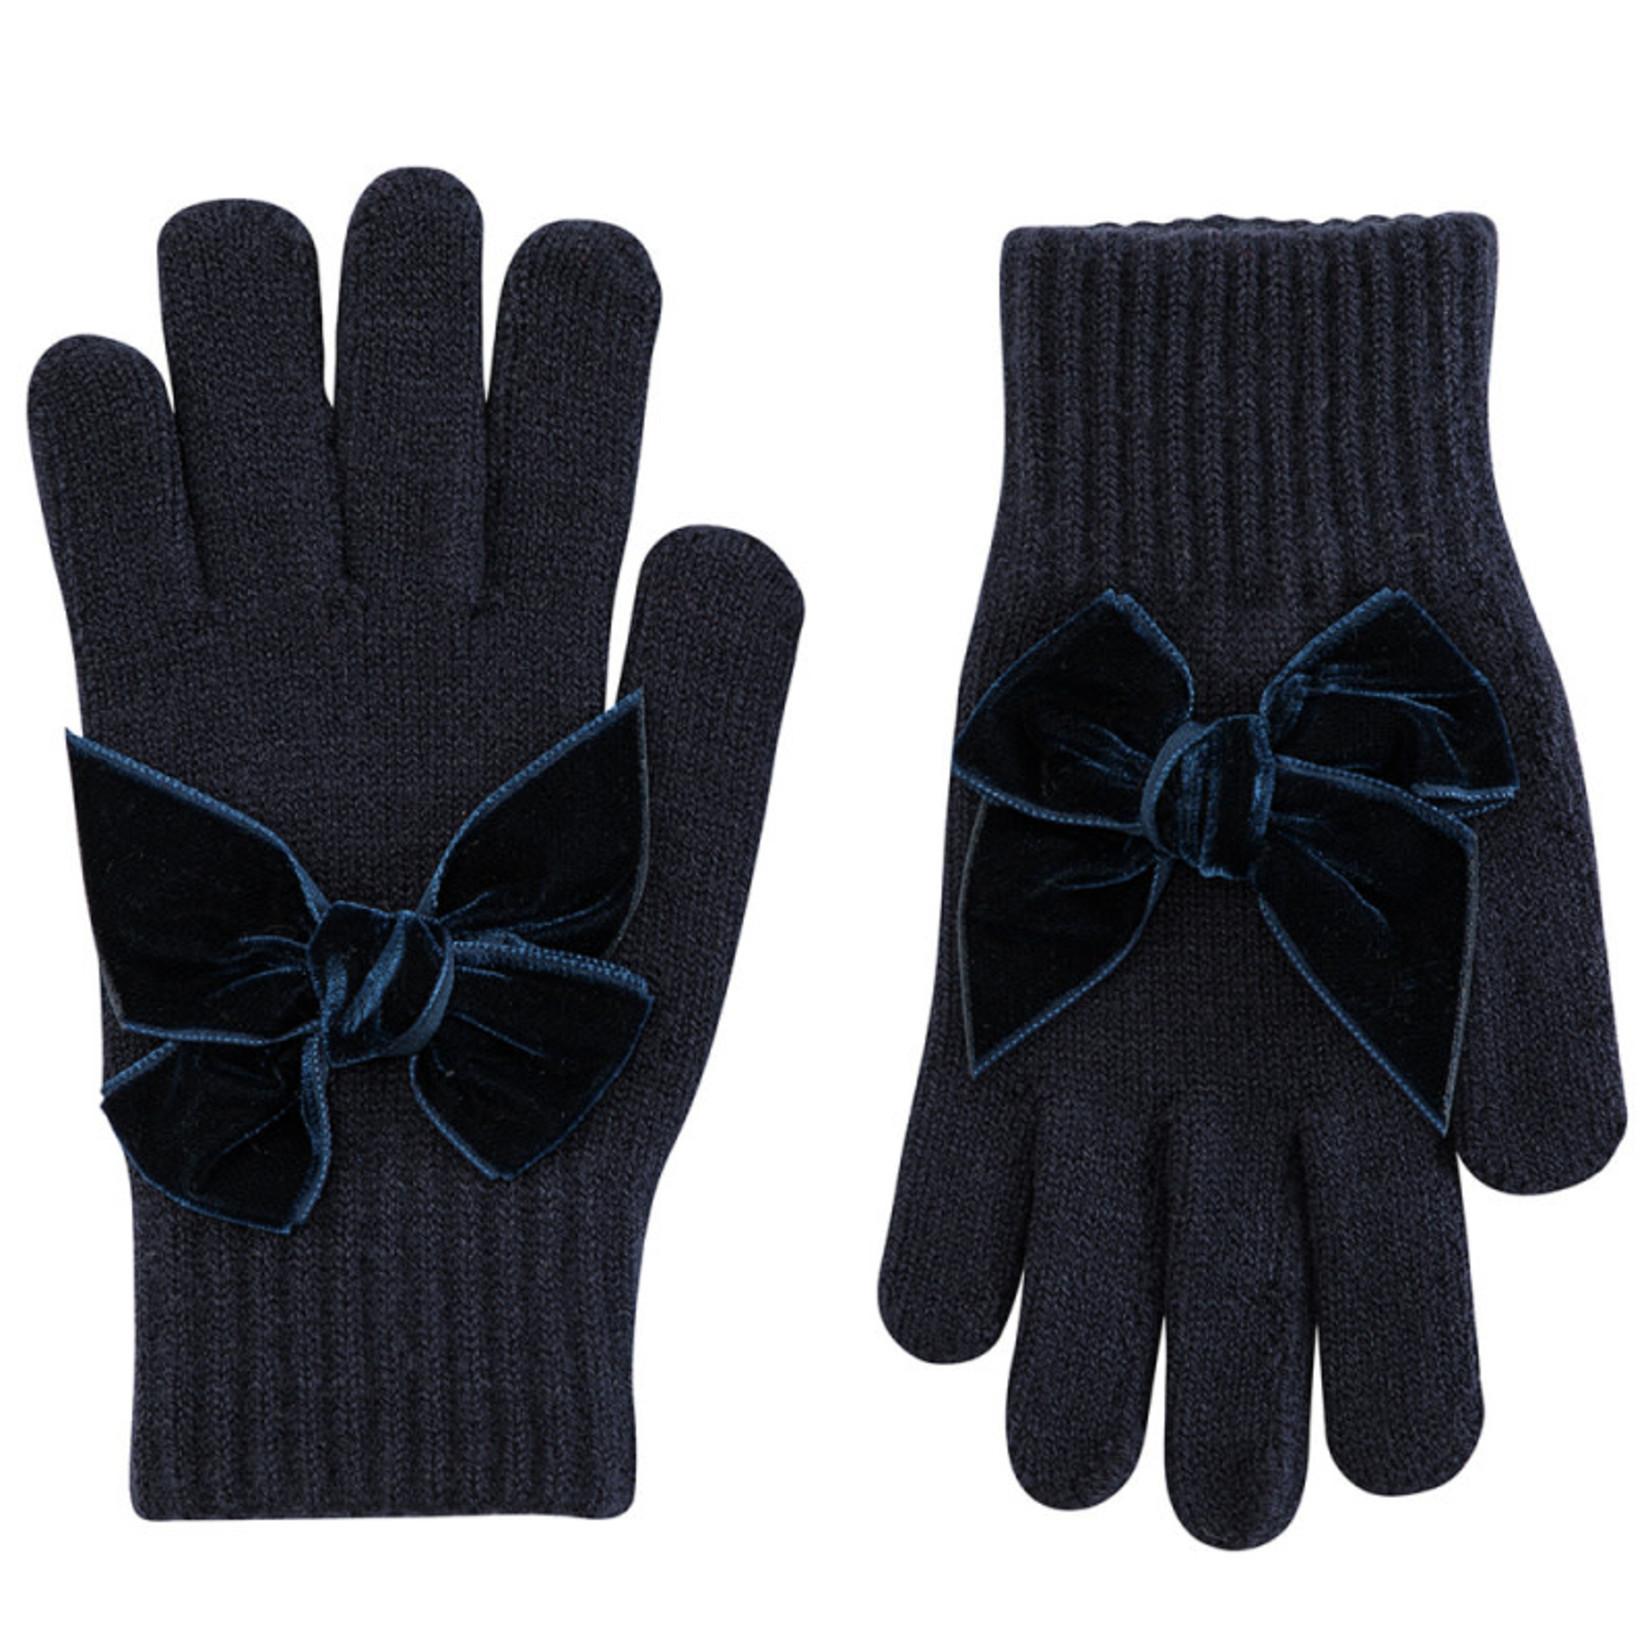 Condor Gloves - Navy